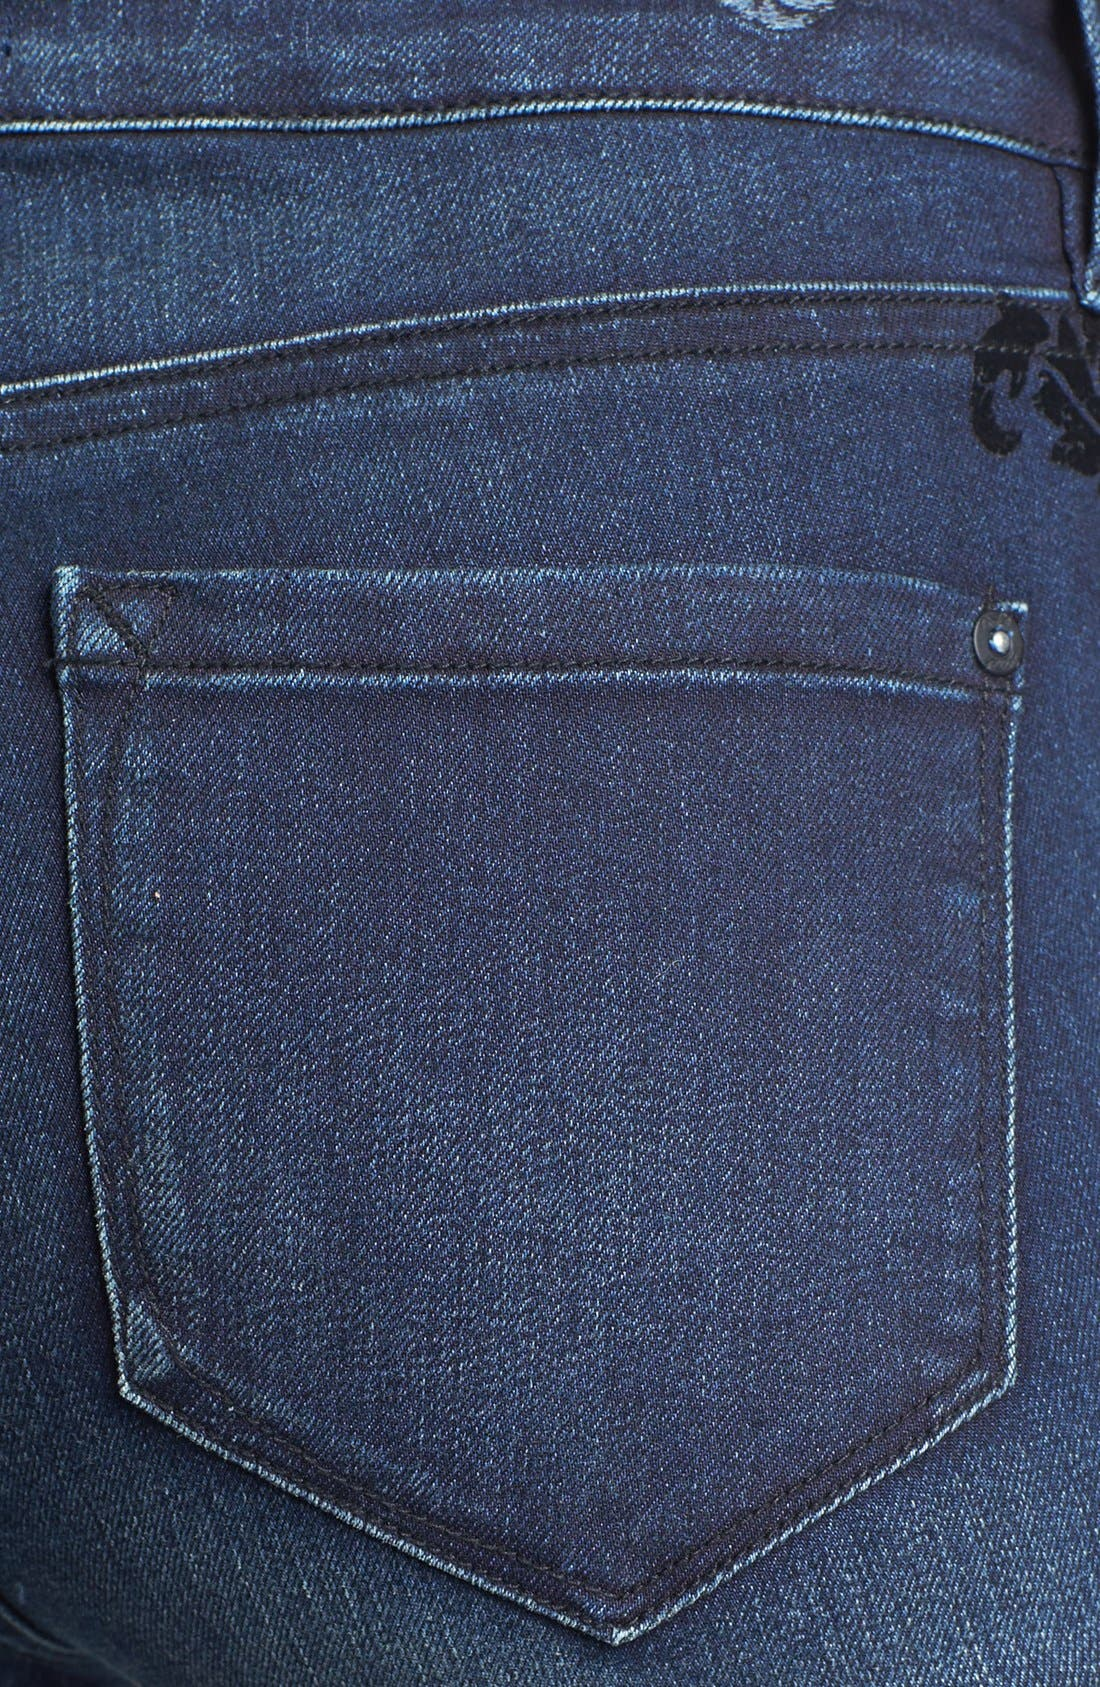 Alternate Image 3  - kensie 'Ankle Biter' Flocked Skinny Jeans (Midnight)